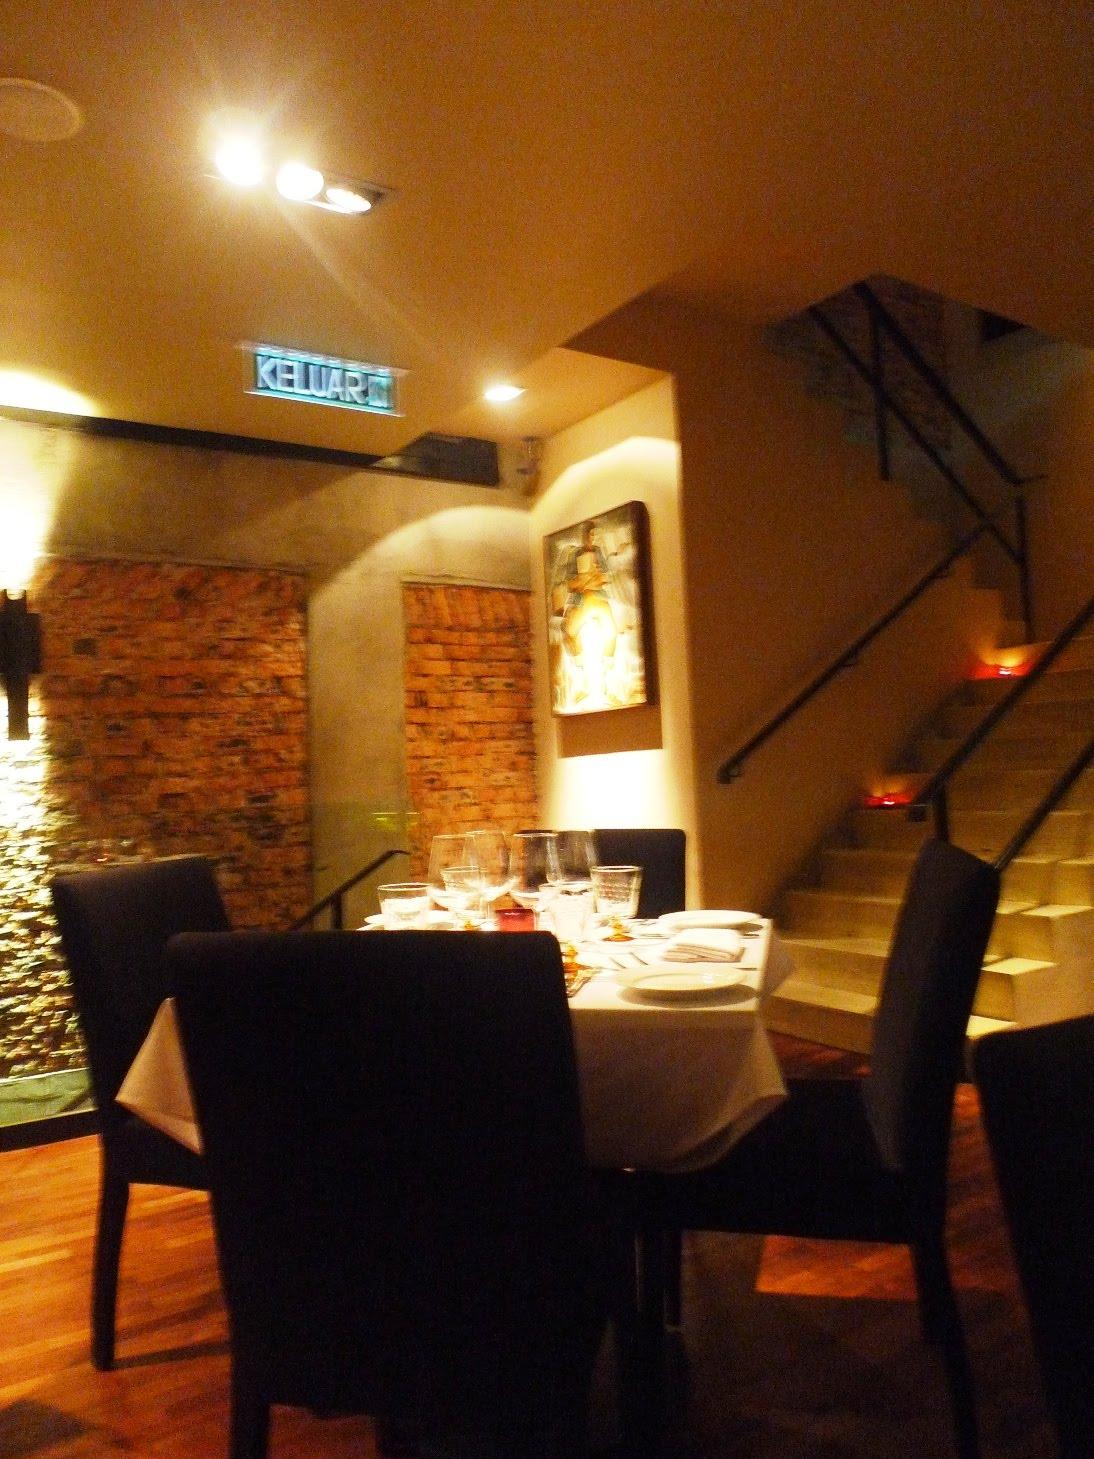 Augustdinersfoodblog ms jazz reviews leonardo 39 s dining for Leonardo s dining room